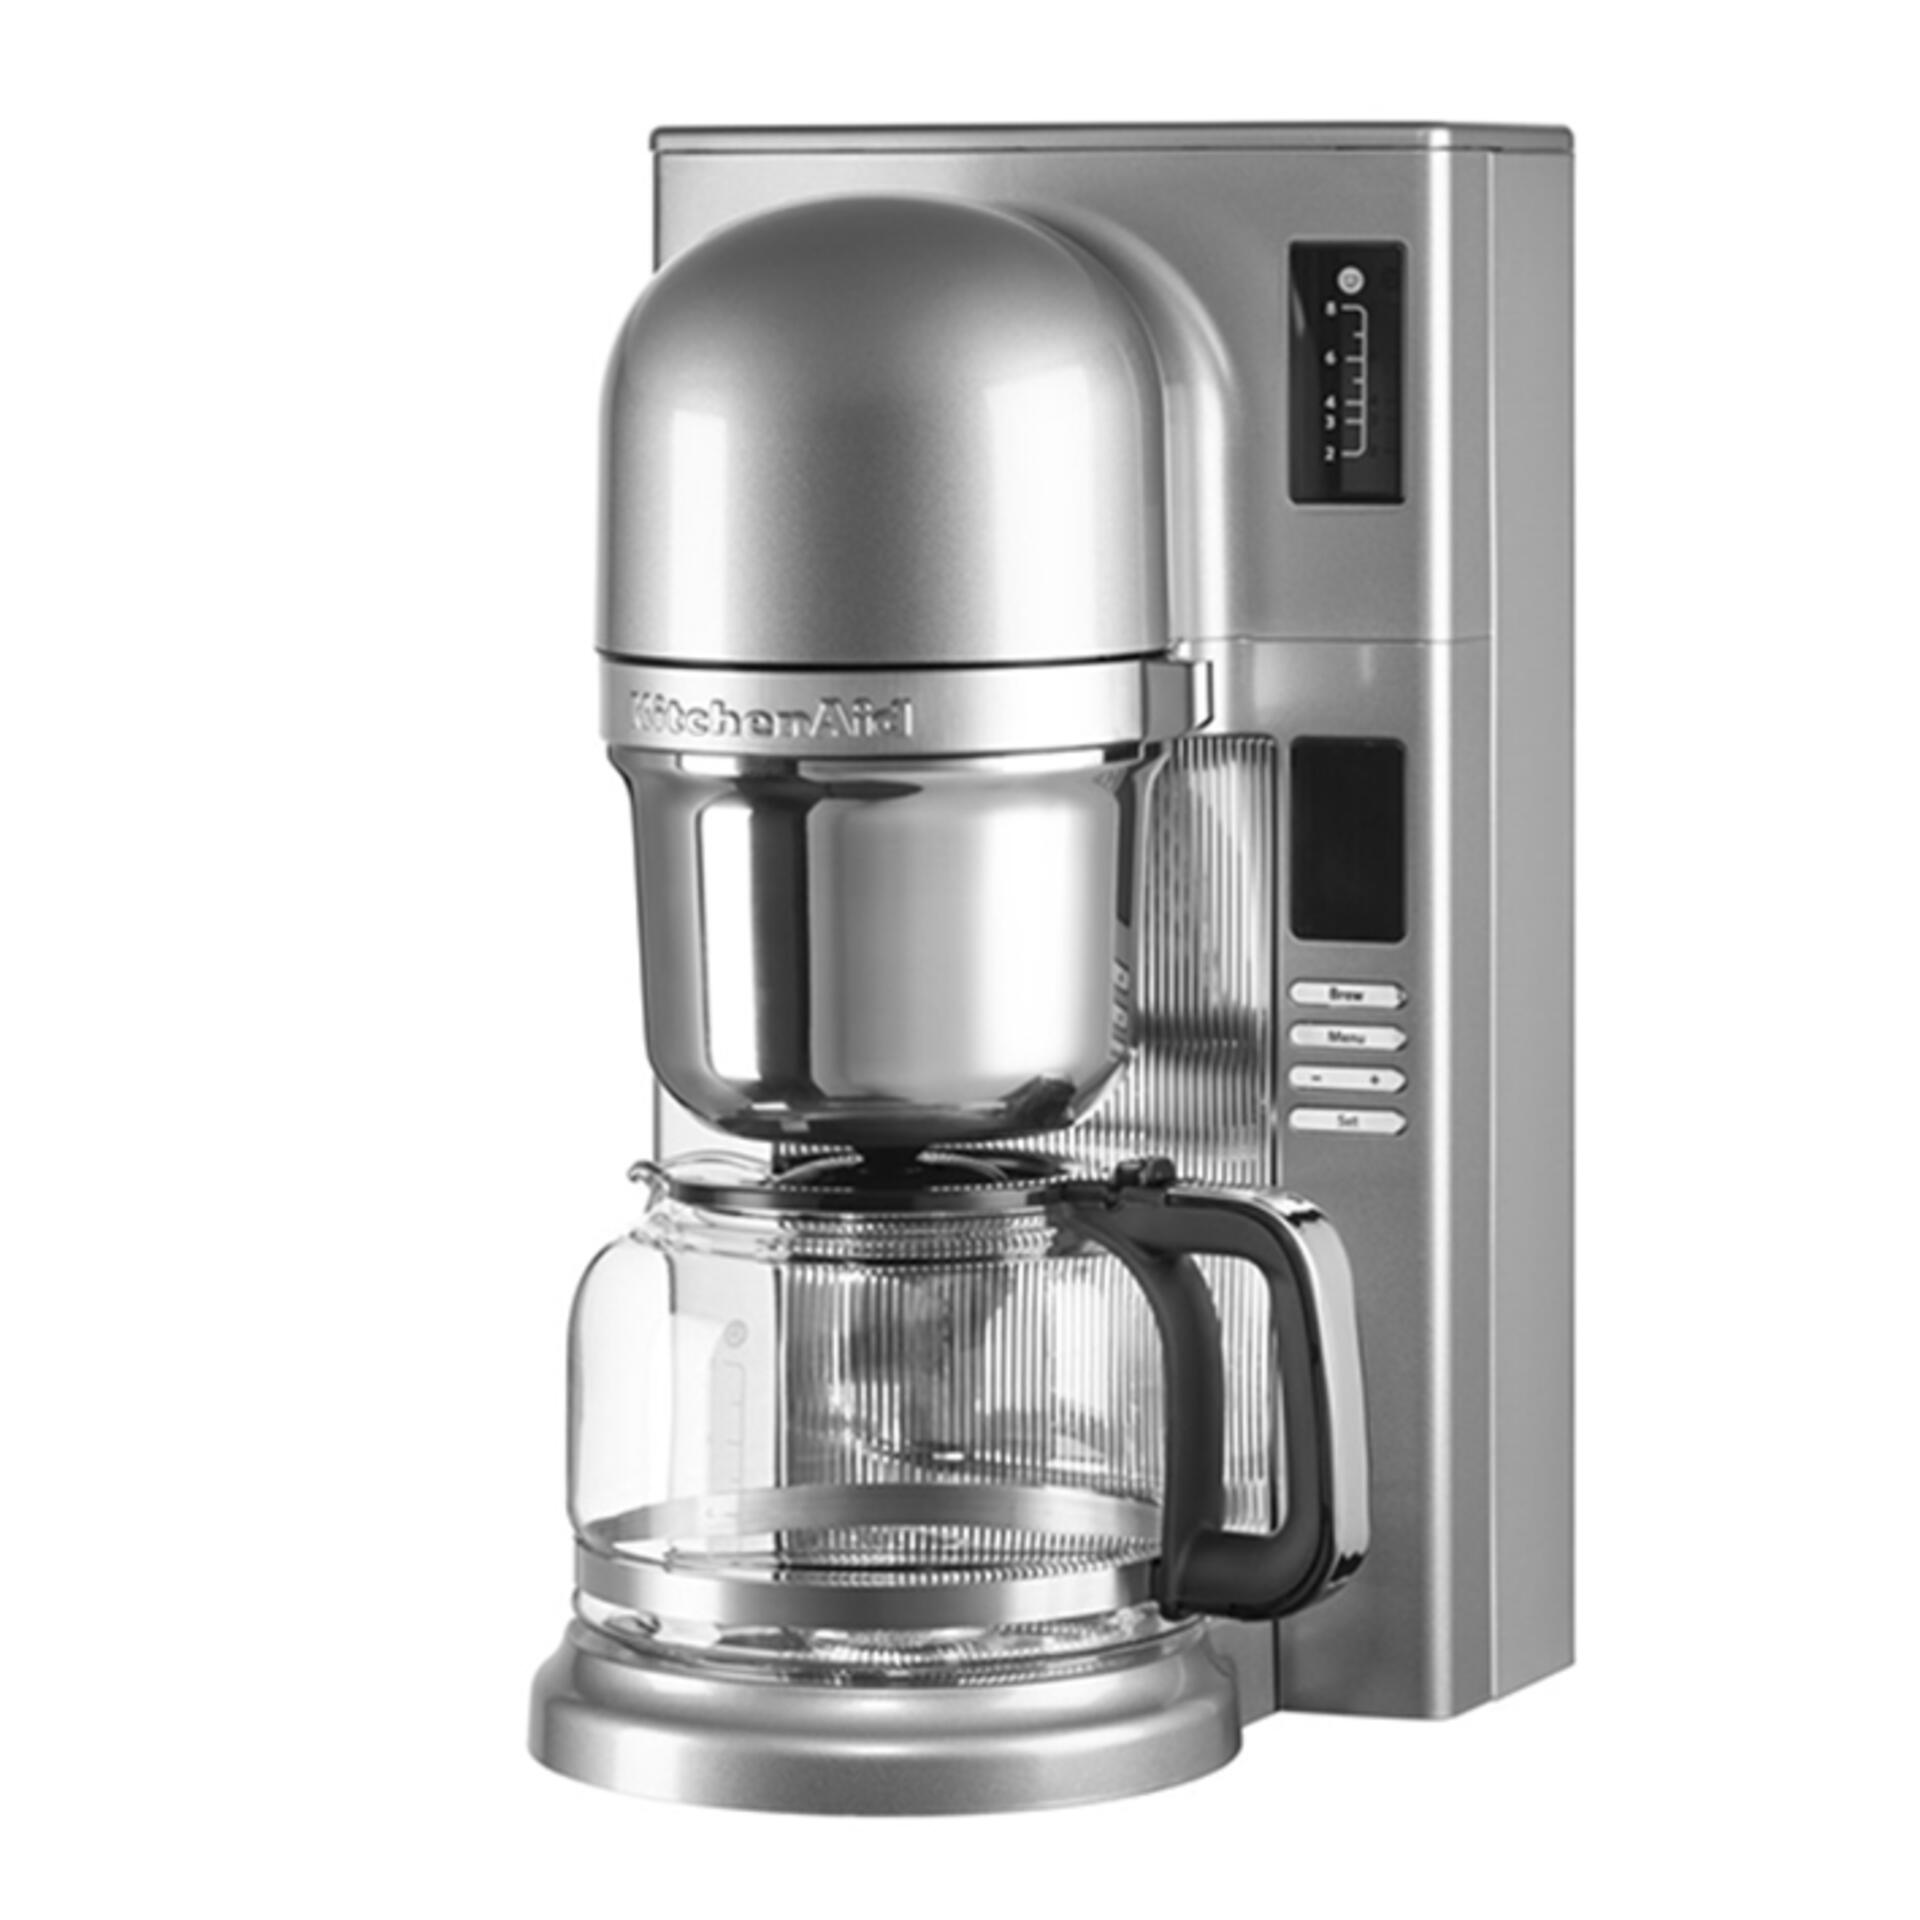 KitchenAid Kaffeemaschine Silber 5KCM0802ECU